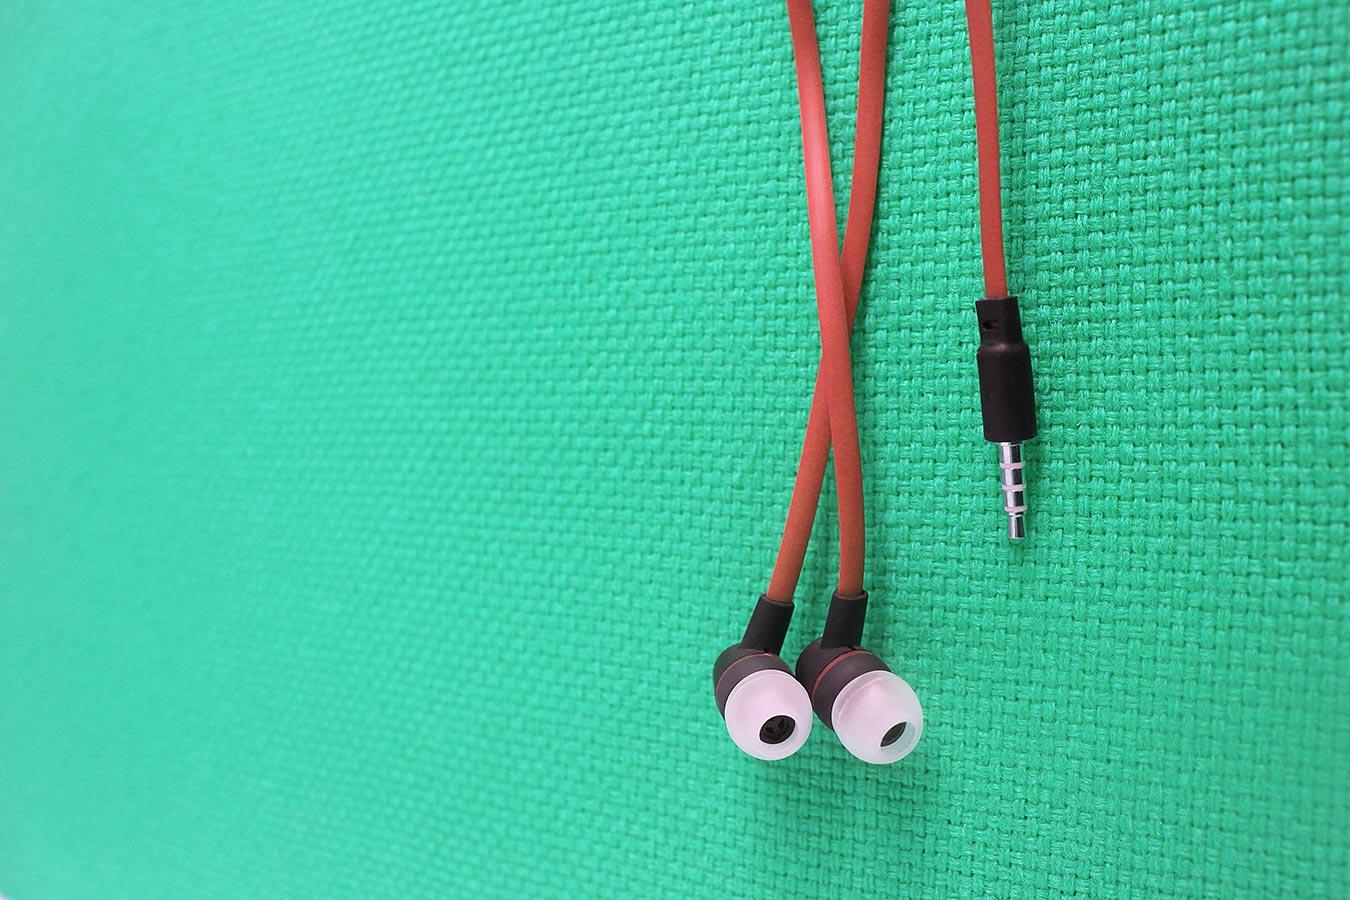 26. trening: Bolje da ti ispadne slušalica iz uha nego uho iz slušalice